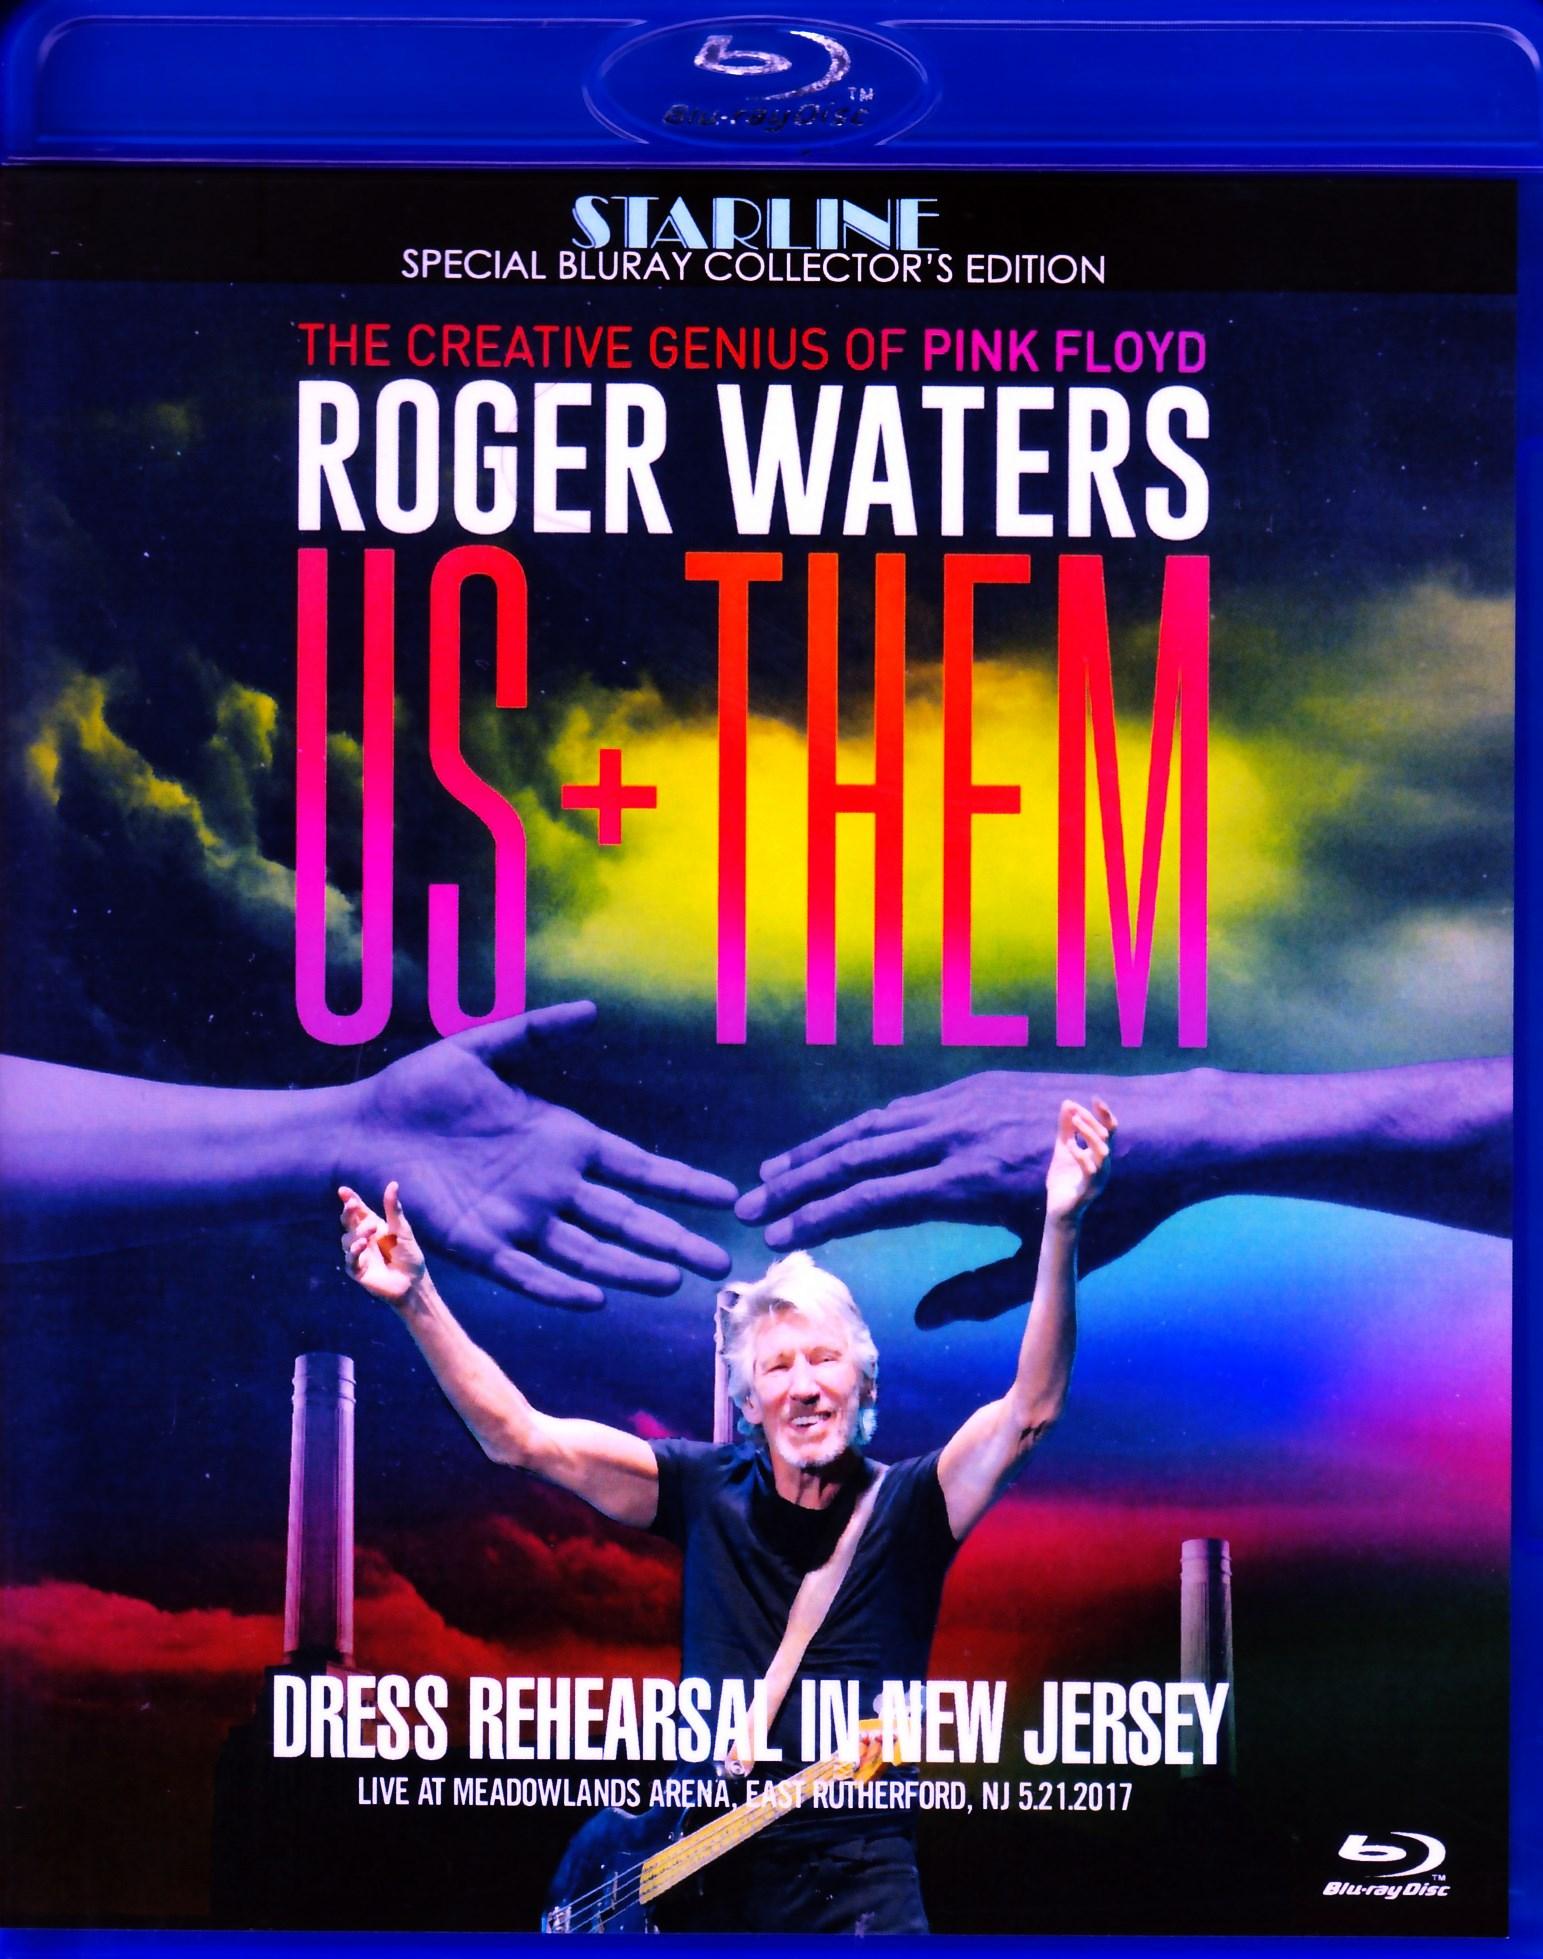 Roger Waters ロジャー・ウォータージ/NJ,USA 2017 & more Blu-Ray Ver.